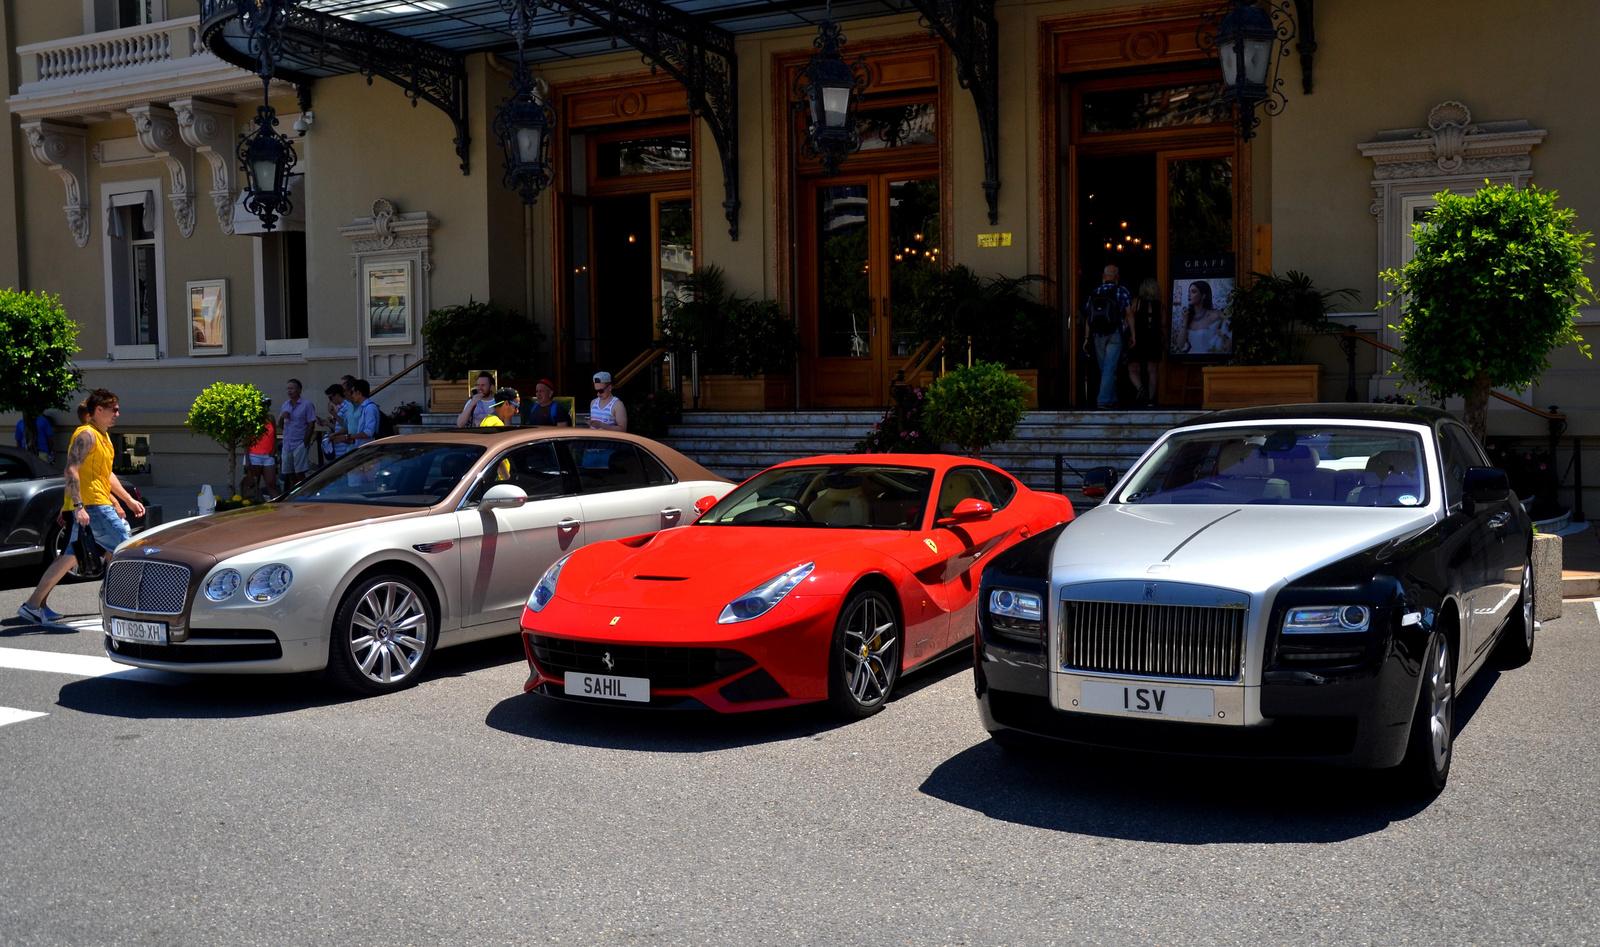 Bentley - Ferrari - Rolls-Royce